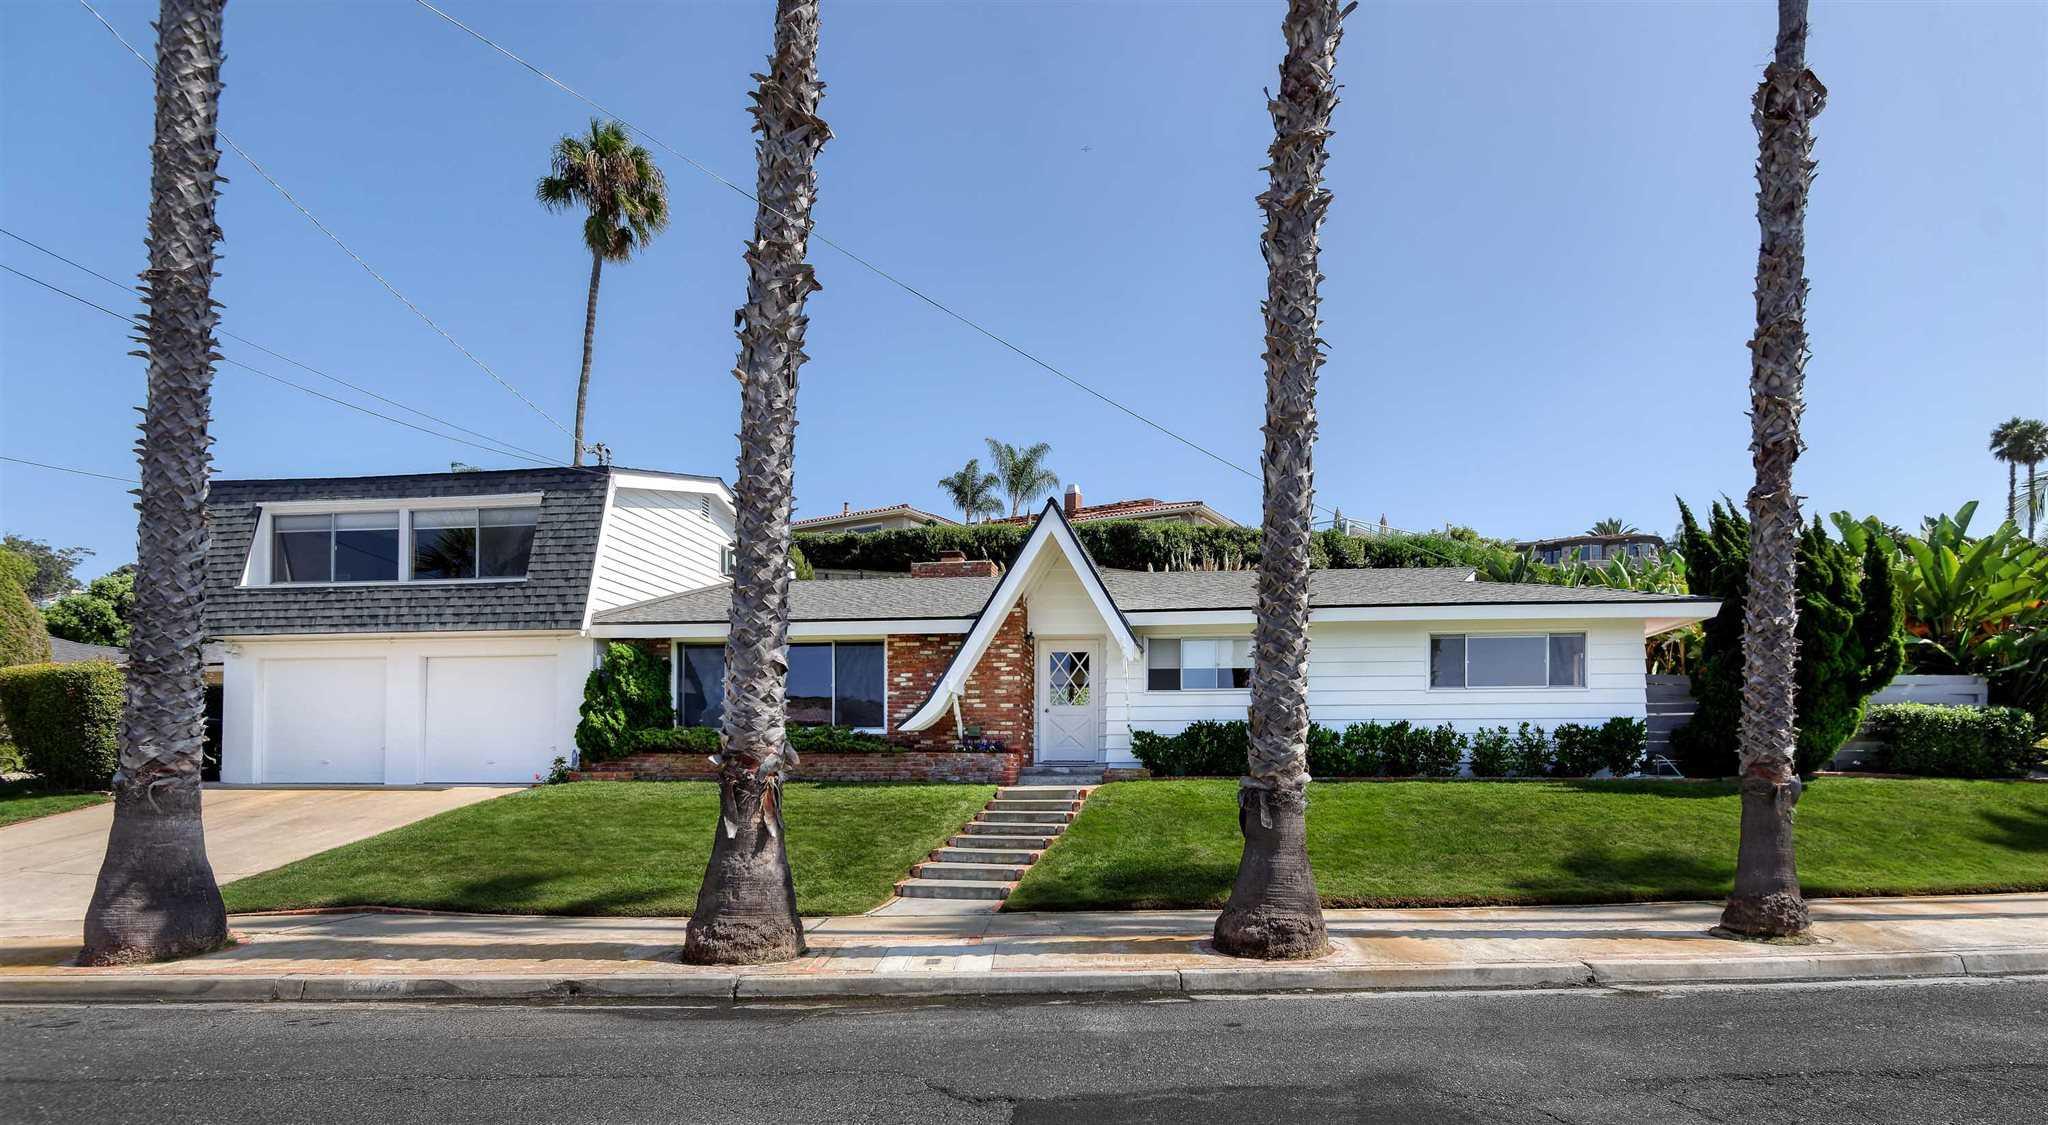 $2,485,000 - 5Br/4Ba -  for Sale in Muirlands Village, La Jolla